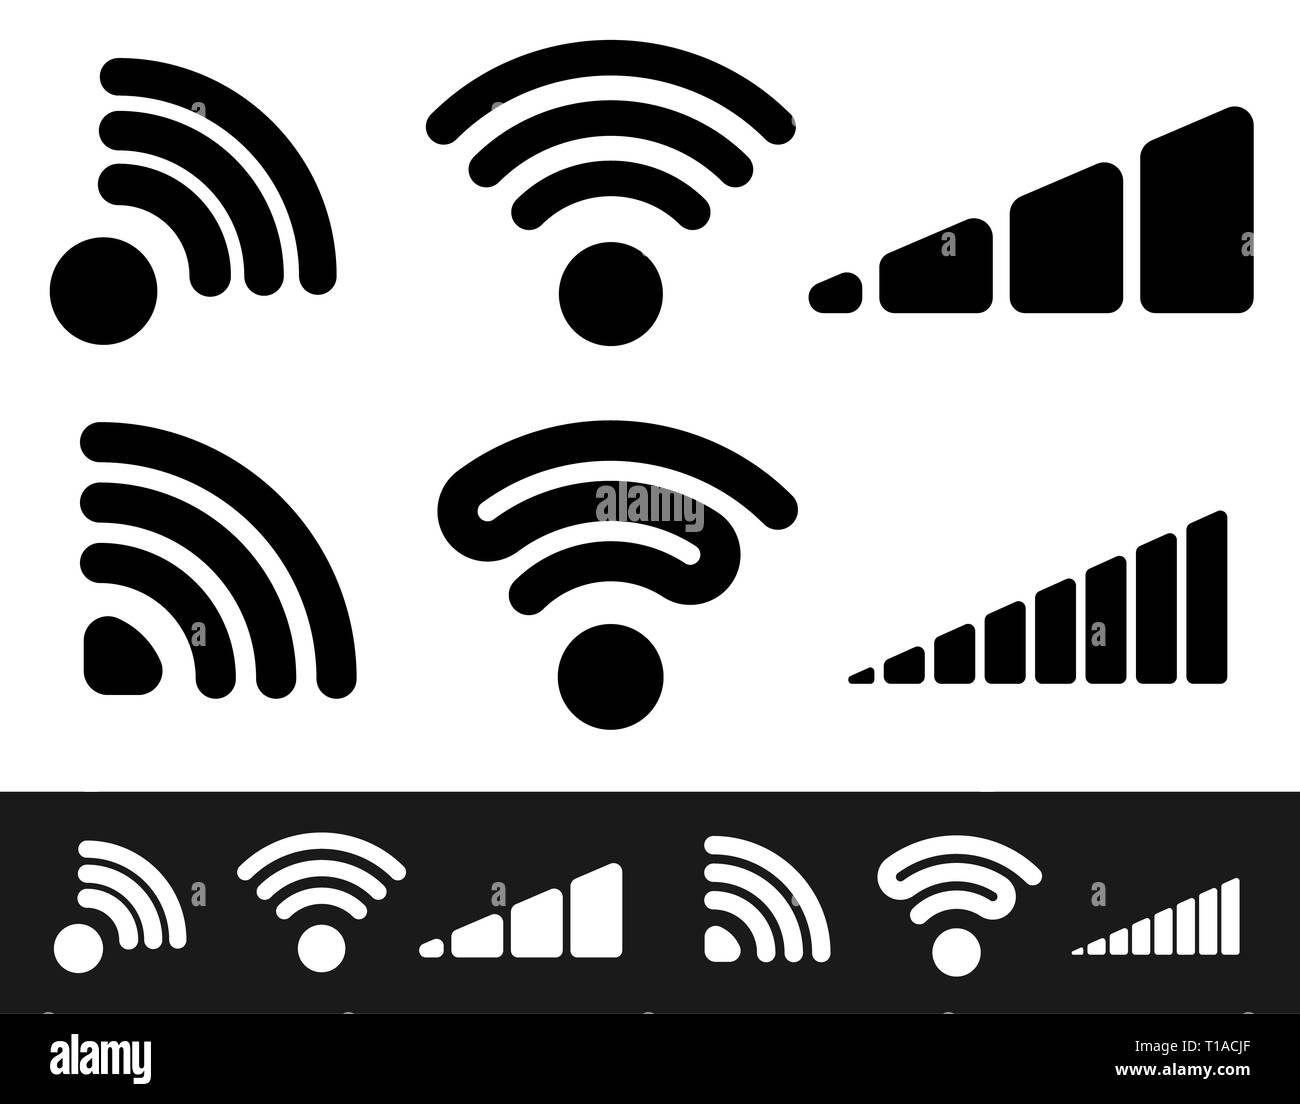 Signal shape templates. editable vector graphics. eps10 - Stock Image